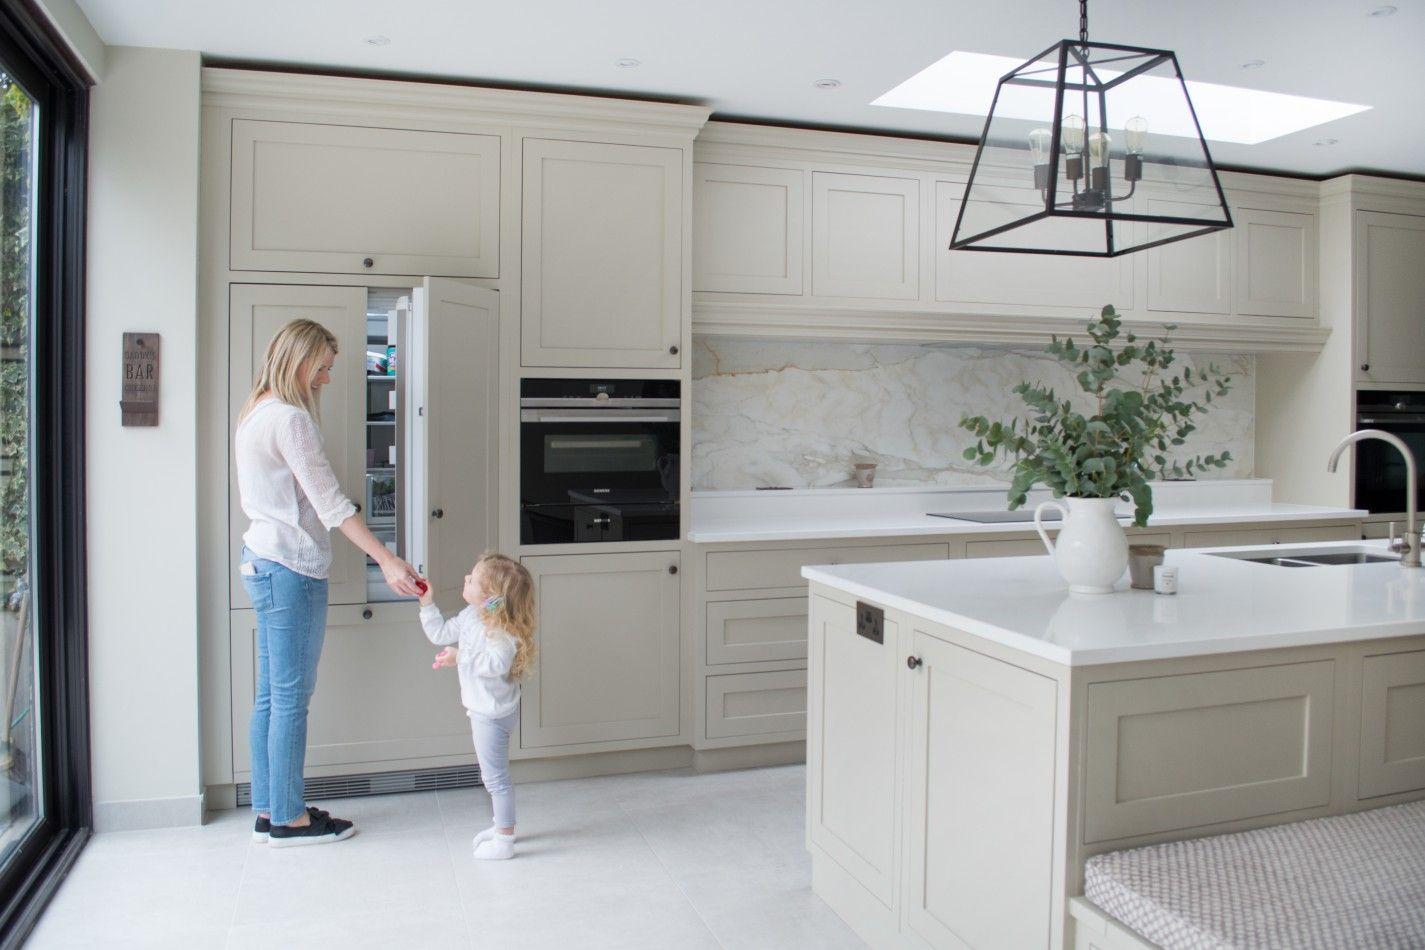 stonehouse furniture. Kitchen Design Battersea | Stonehouse Furniture R